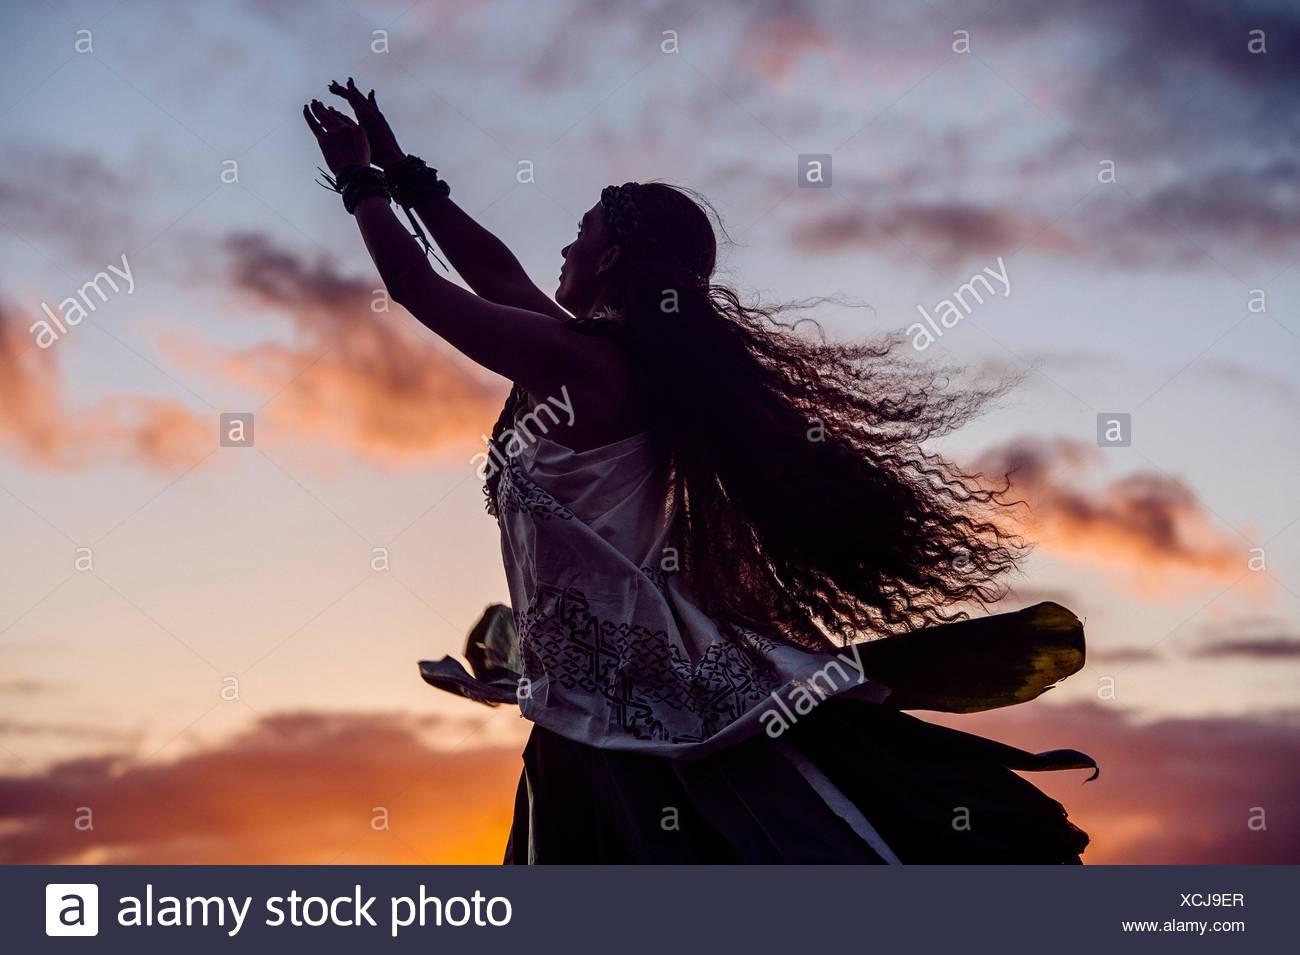 Silhouette Frau Hula tanzen tragen Tracht in der Abenddämmerung, Maui, Hawaii, USA Stockbild